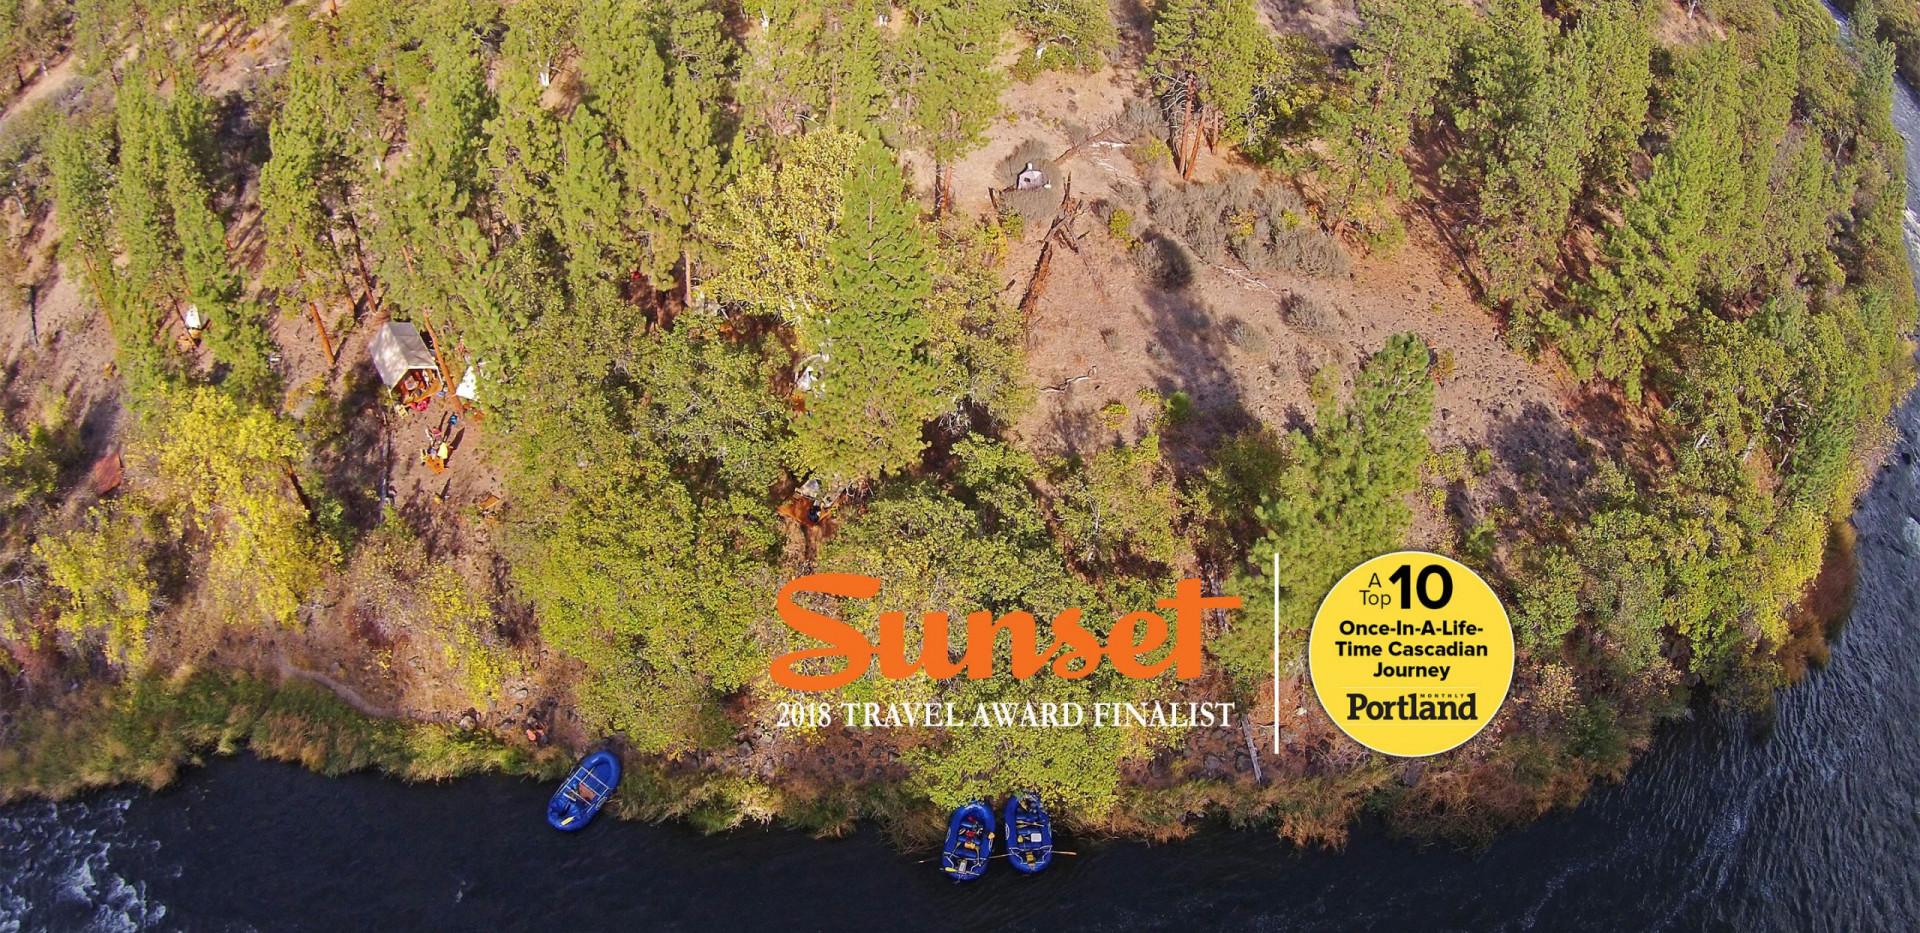 Upper Klamath Rafting Safari - Camping - Glamping - Upper Klamath River